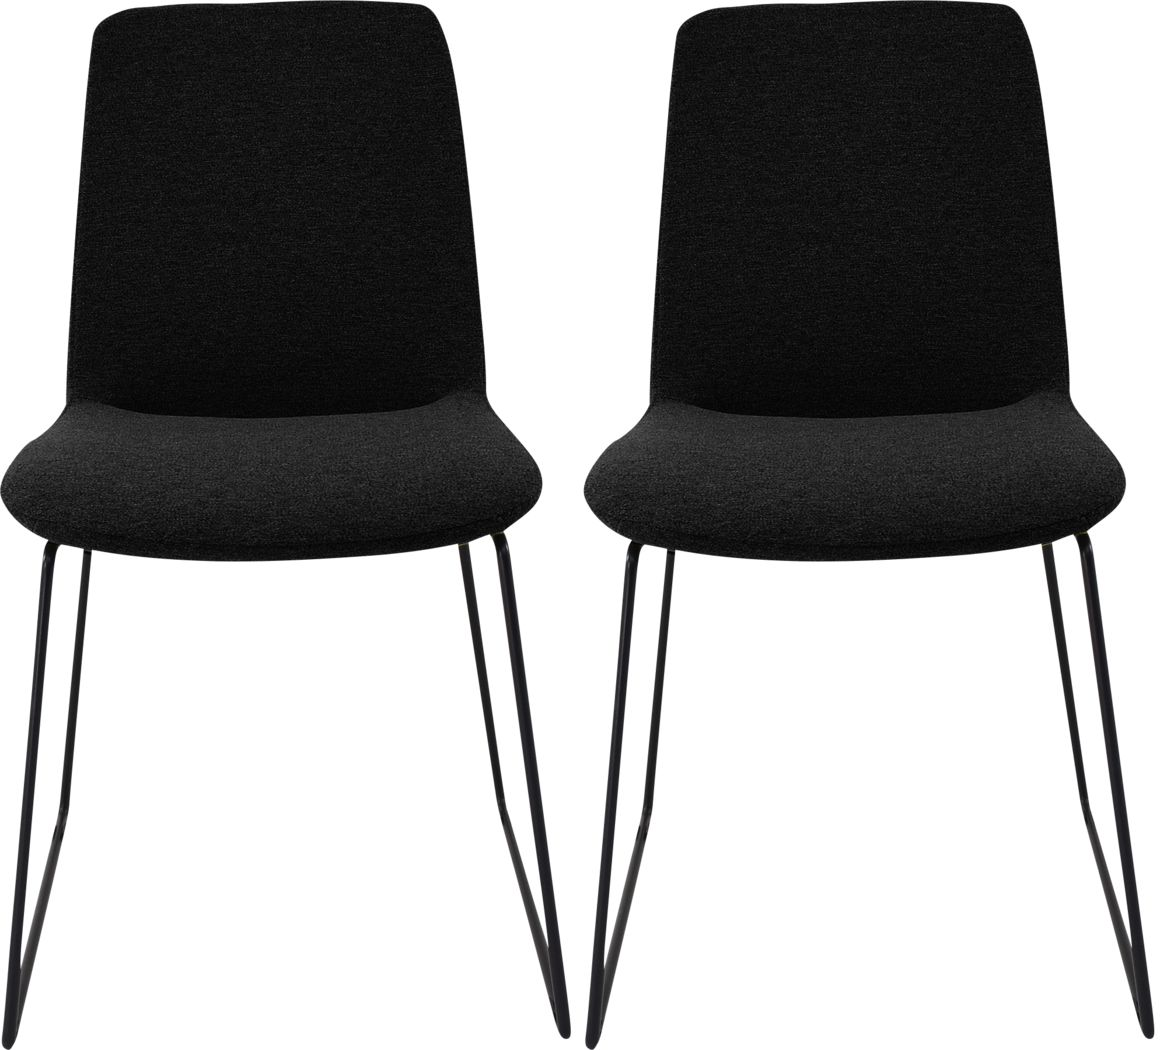 Bermwood Black Dining Chair, Set of 2